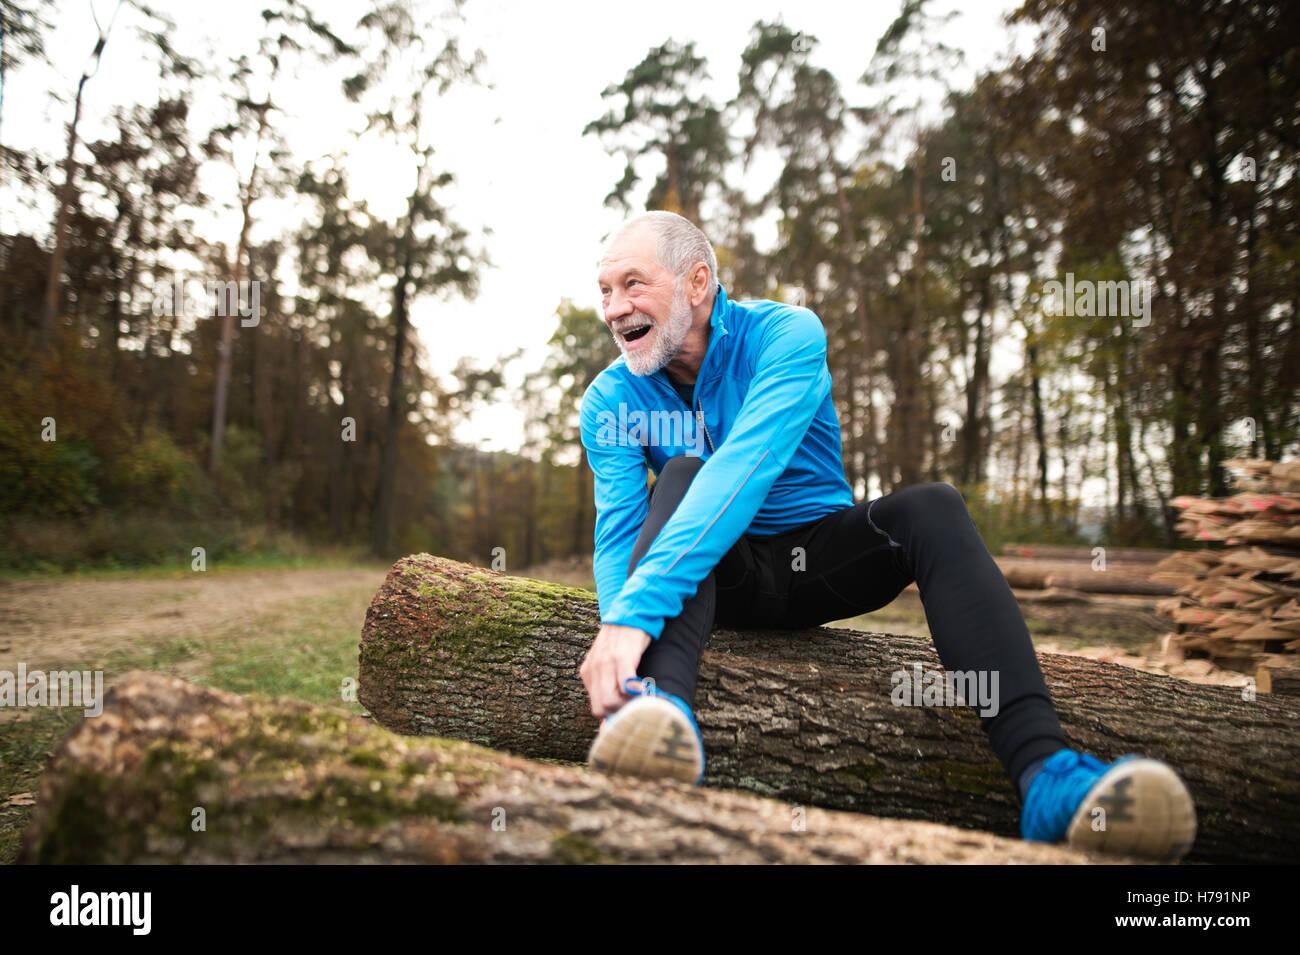 Senior runner sitting on wooden logs, man resting, stretching. - Stock Image